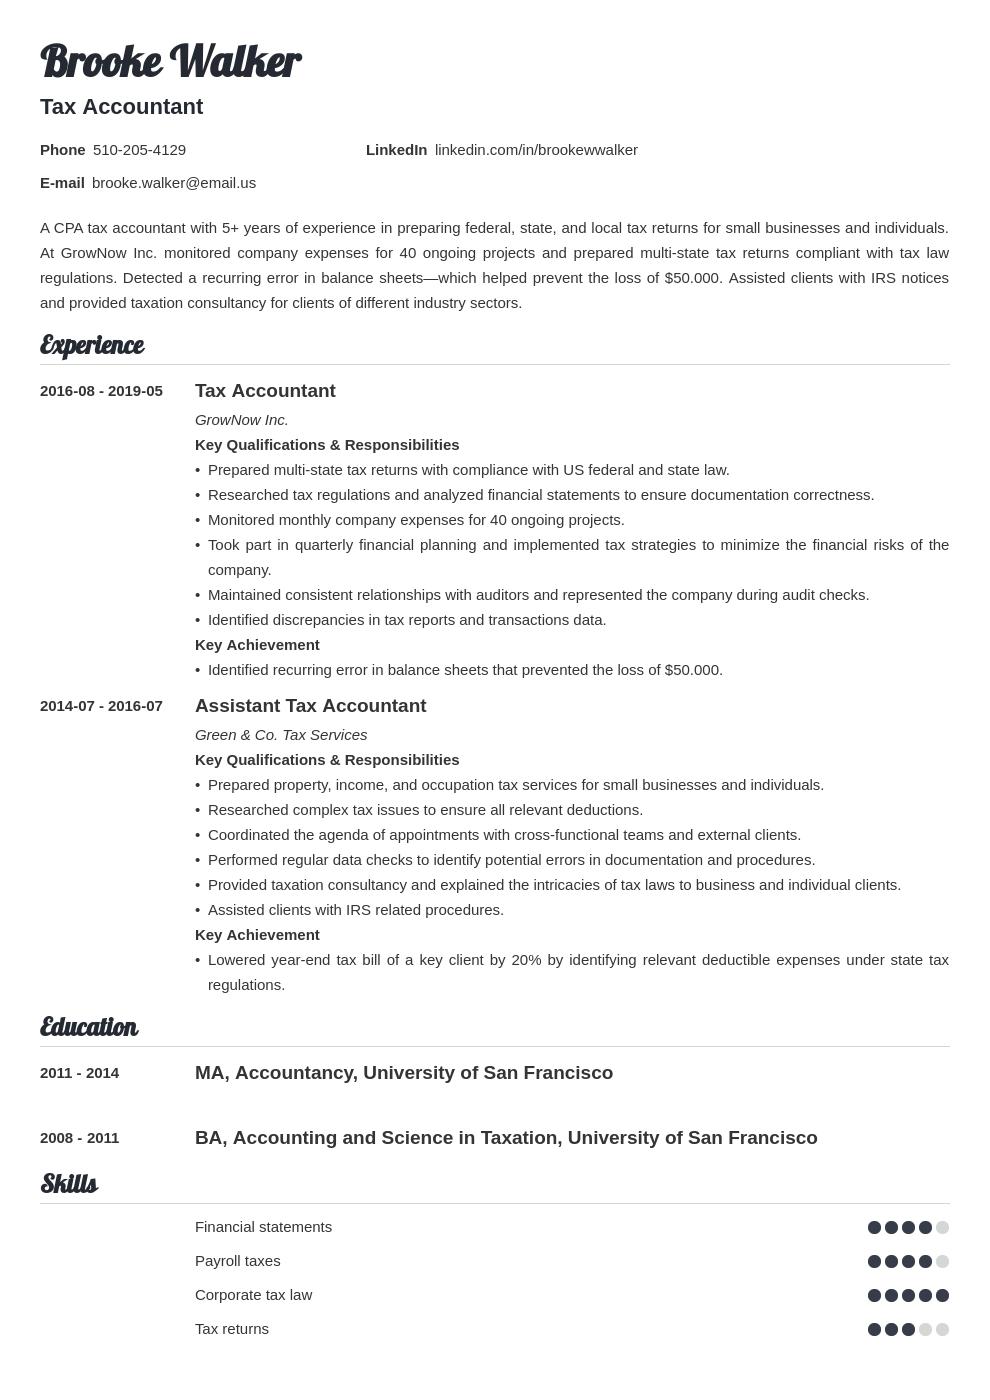 Tax Accountant Resume Example Template Valera In 2020 Accountant Resume Resume Examples Job Resume Examples